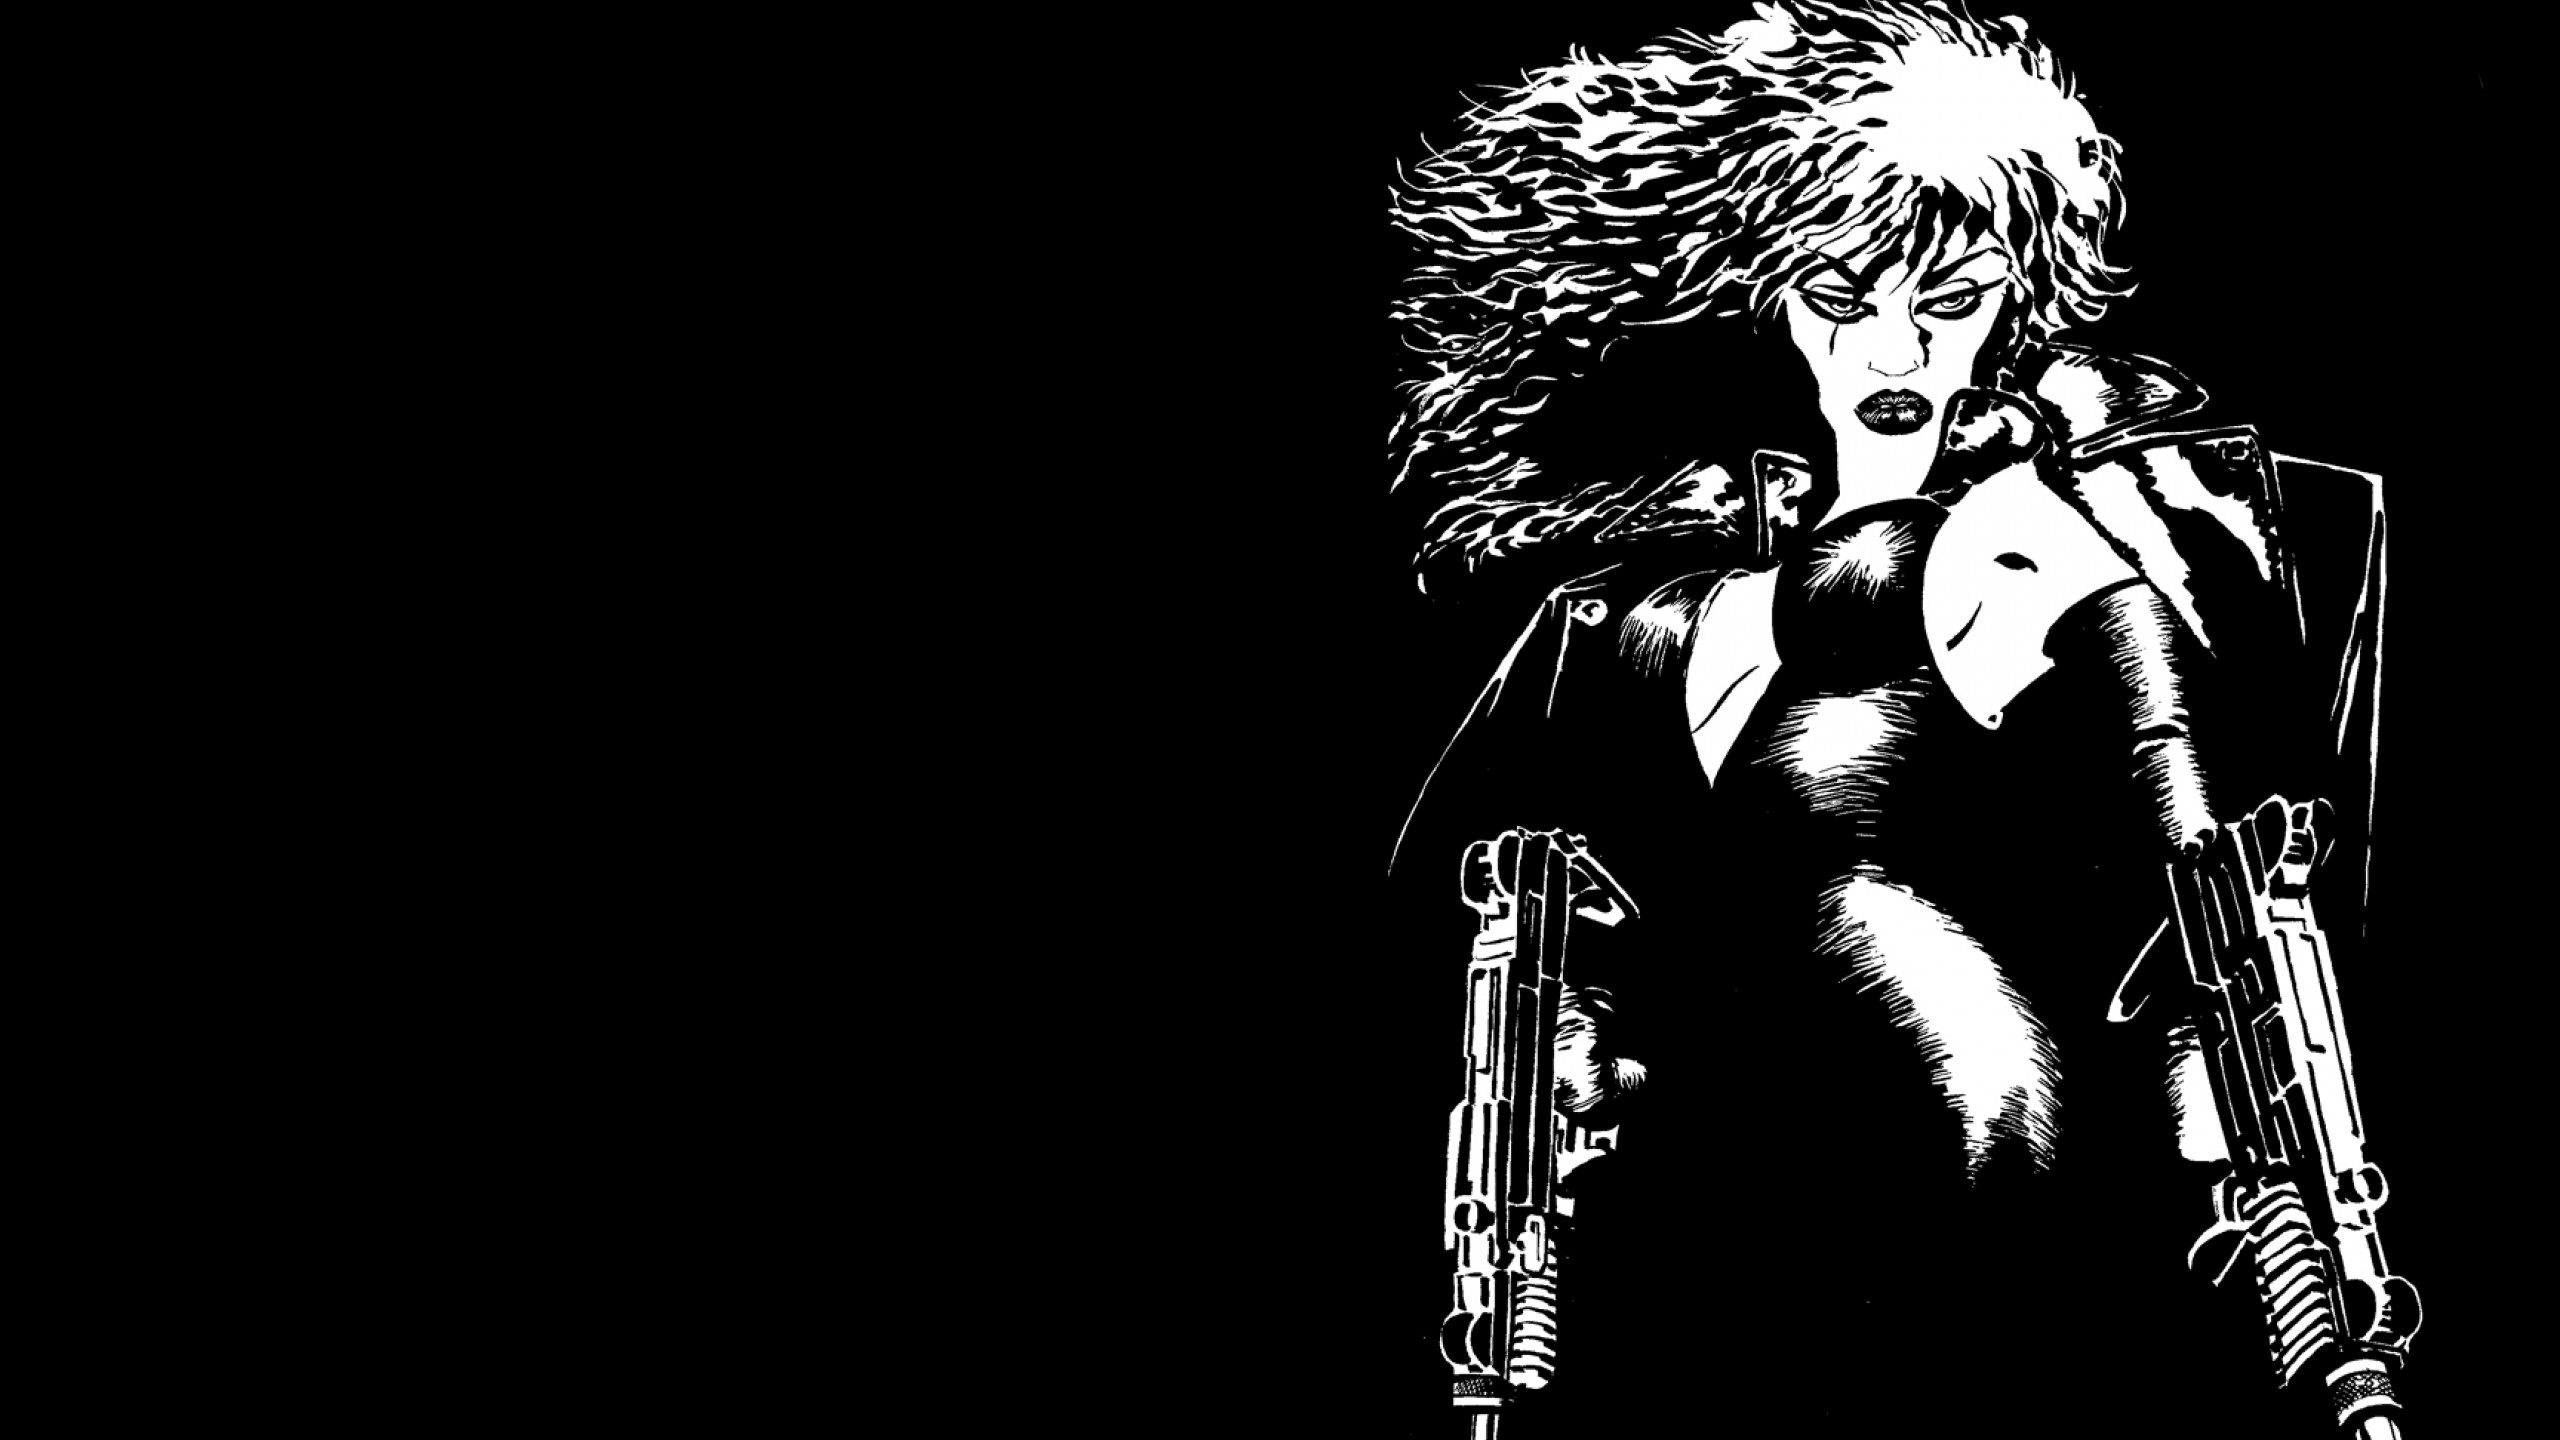 Sin City Comic Book Wallpaper ·①